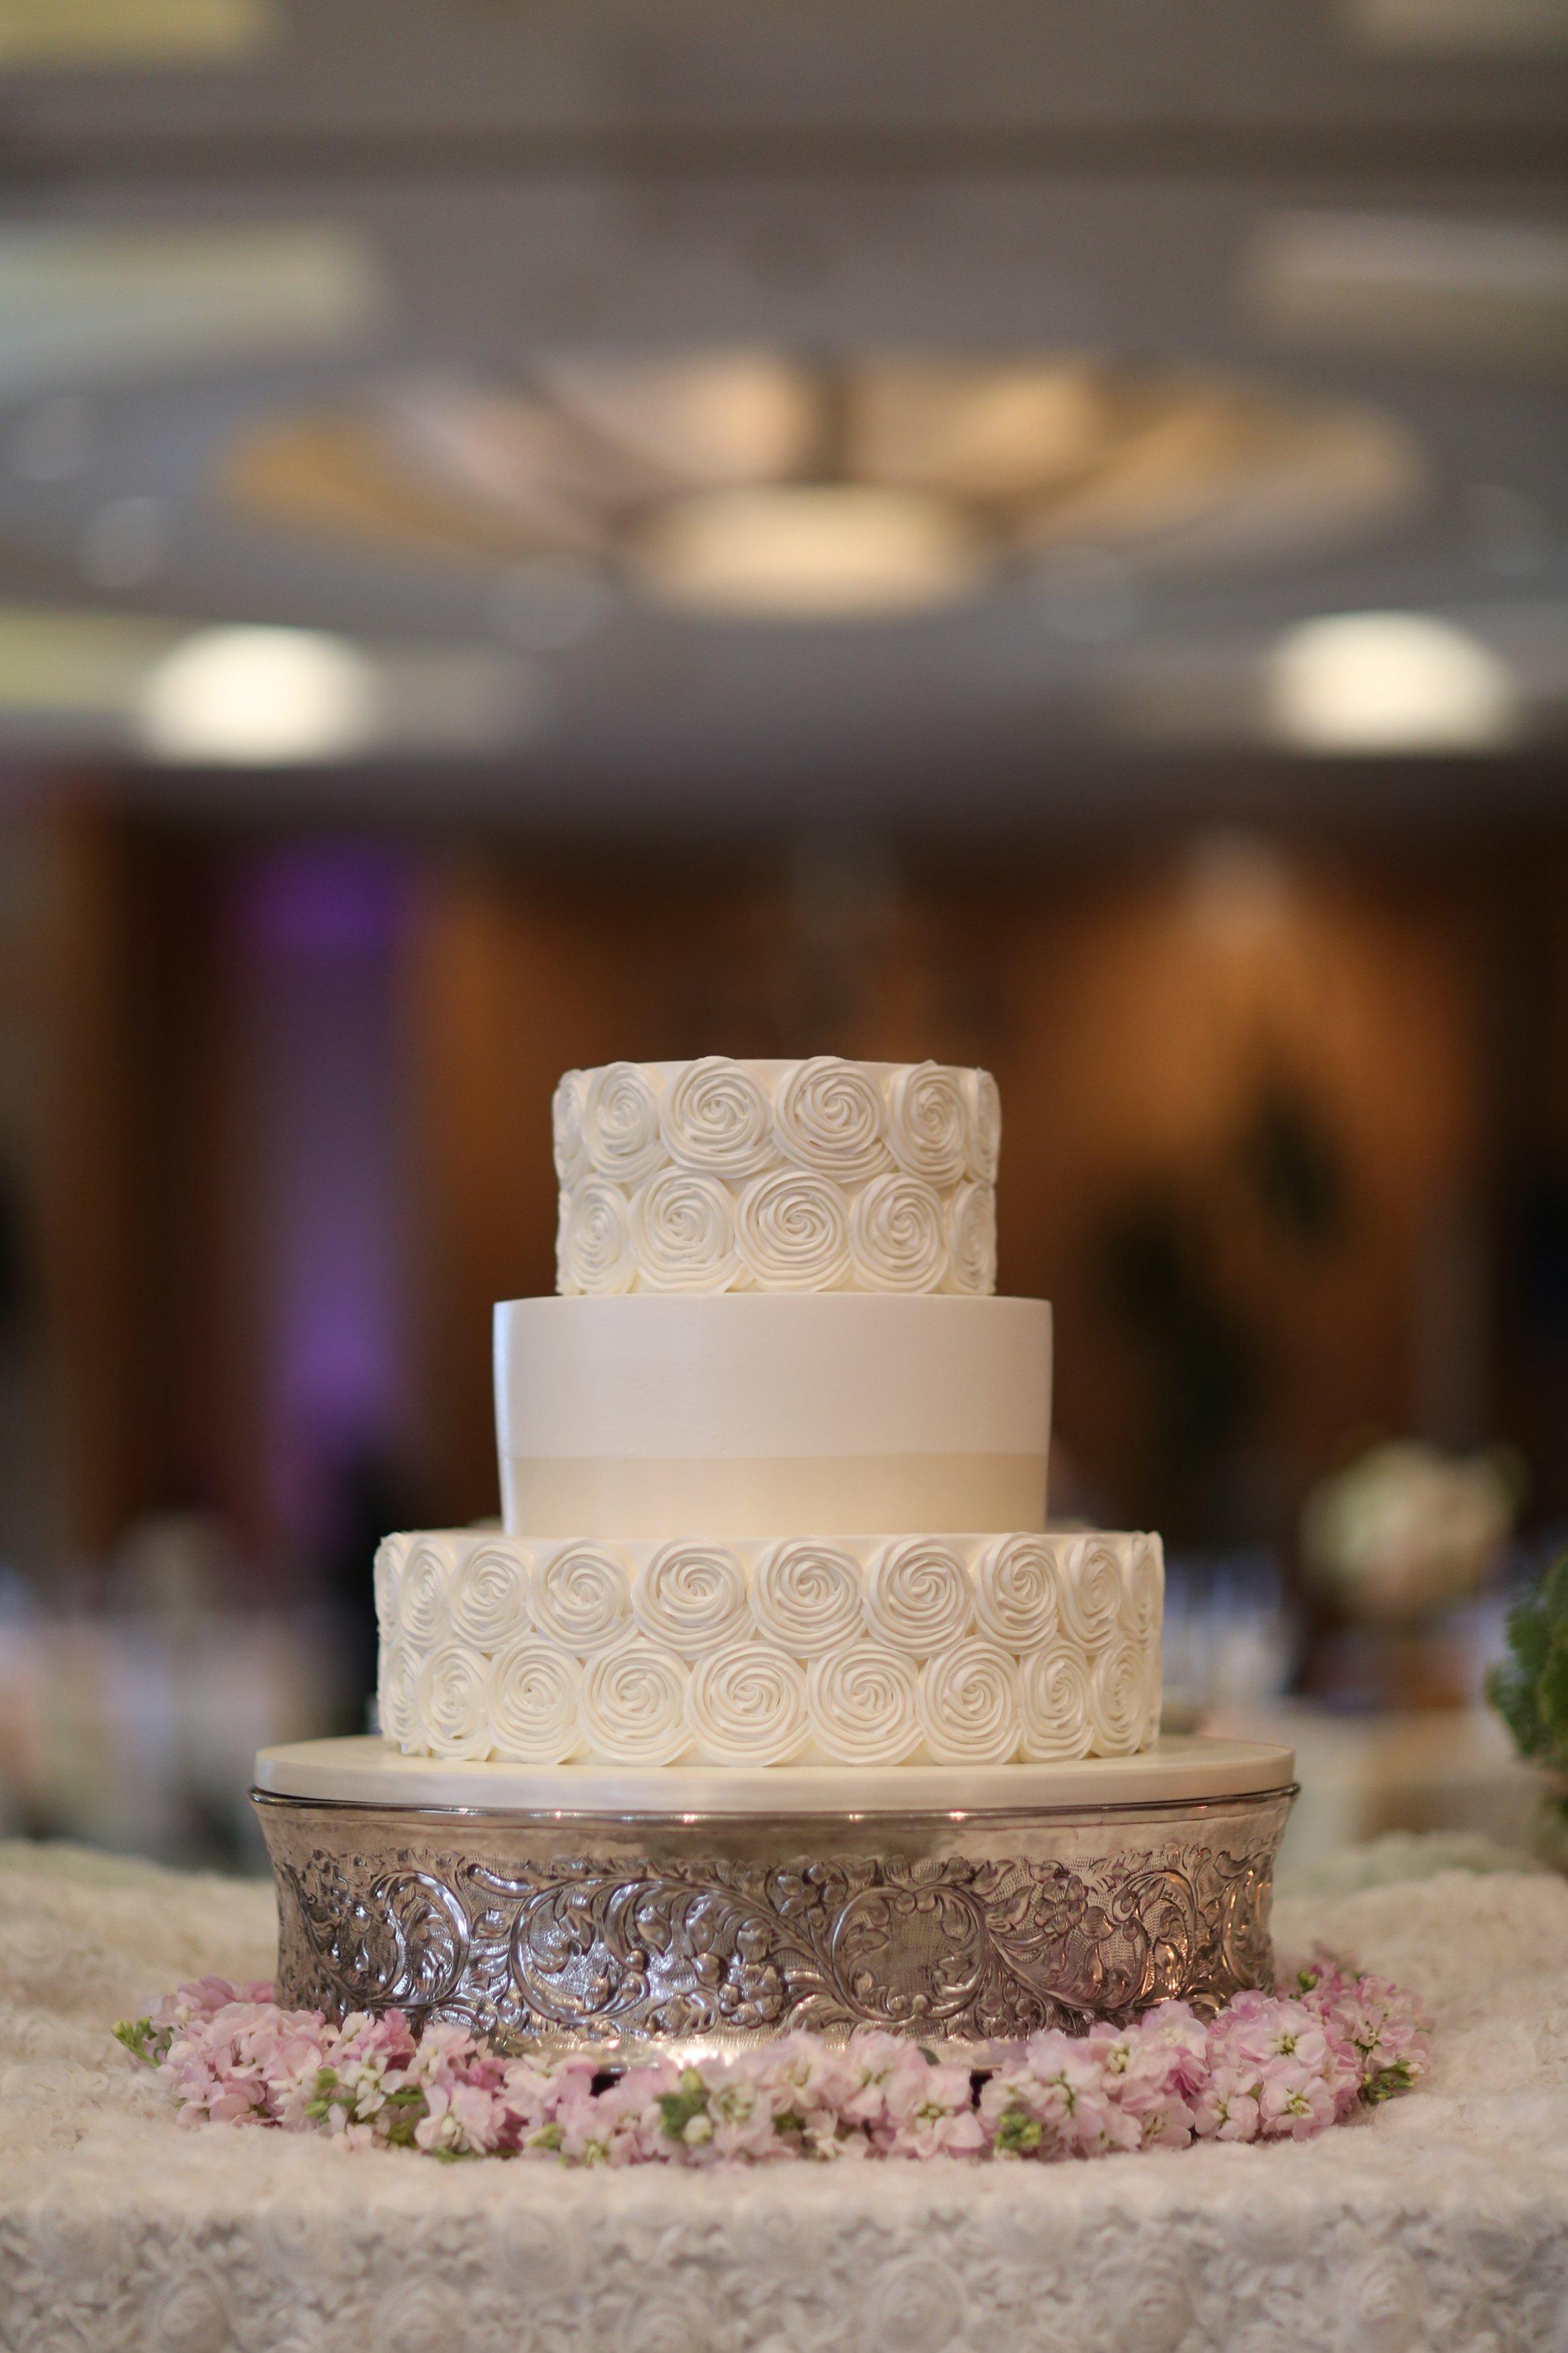 Beautiful cake from Rossmoor Pastries